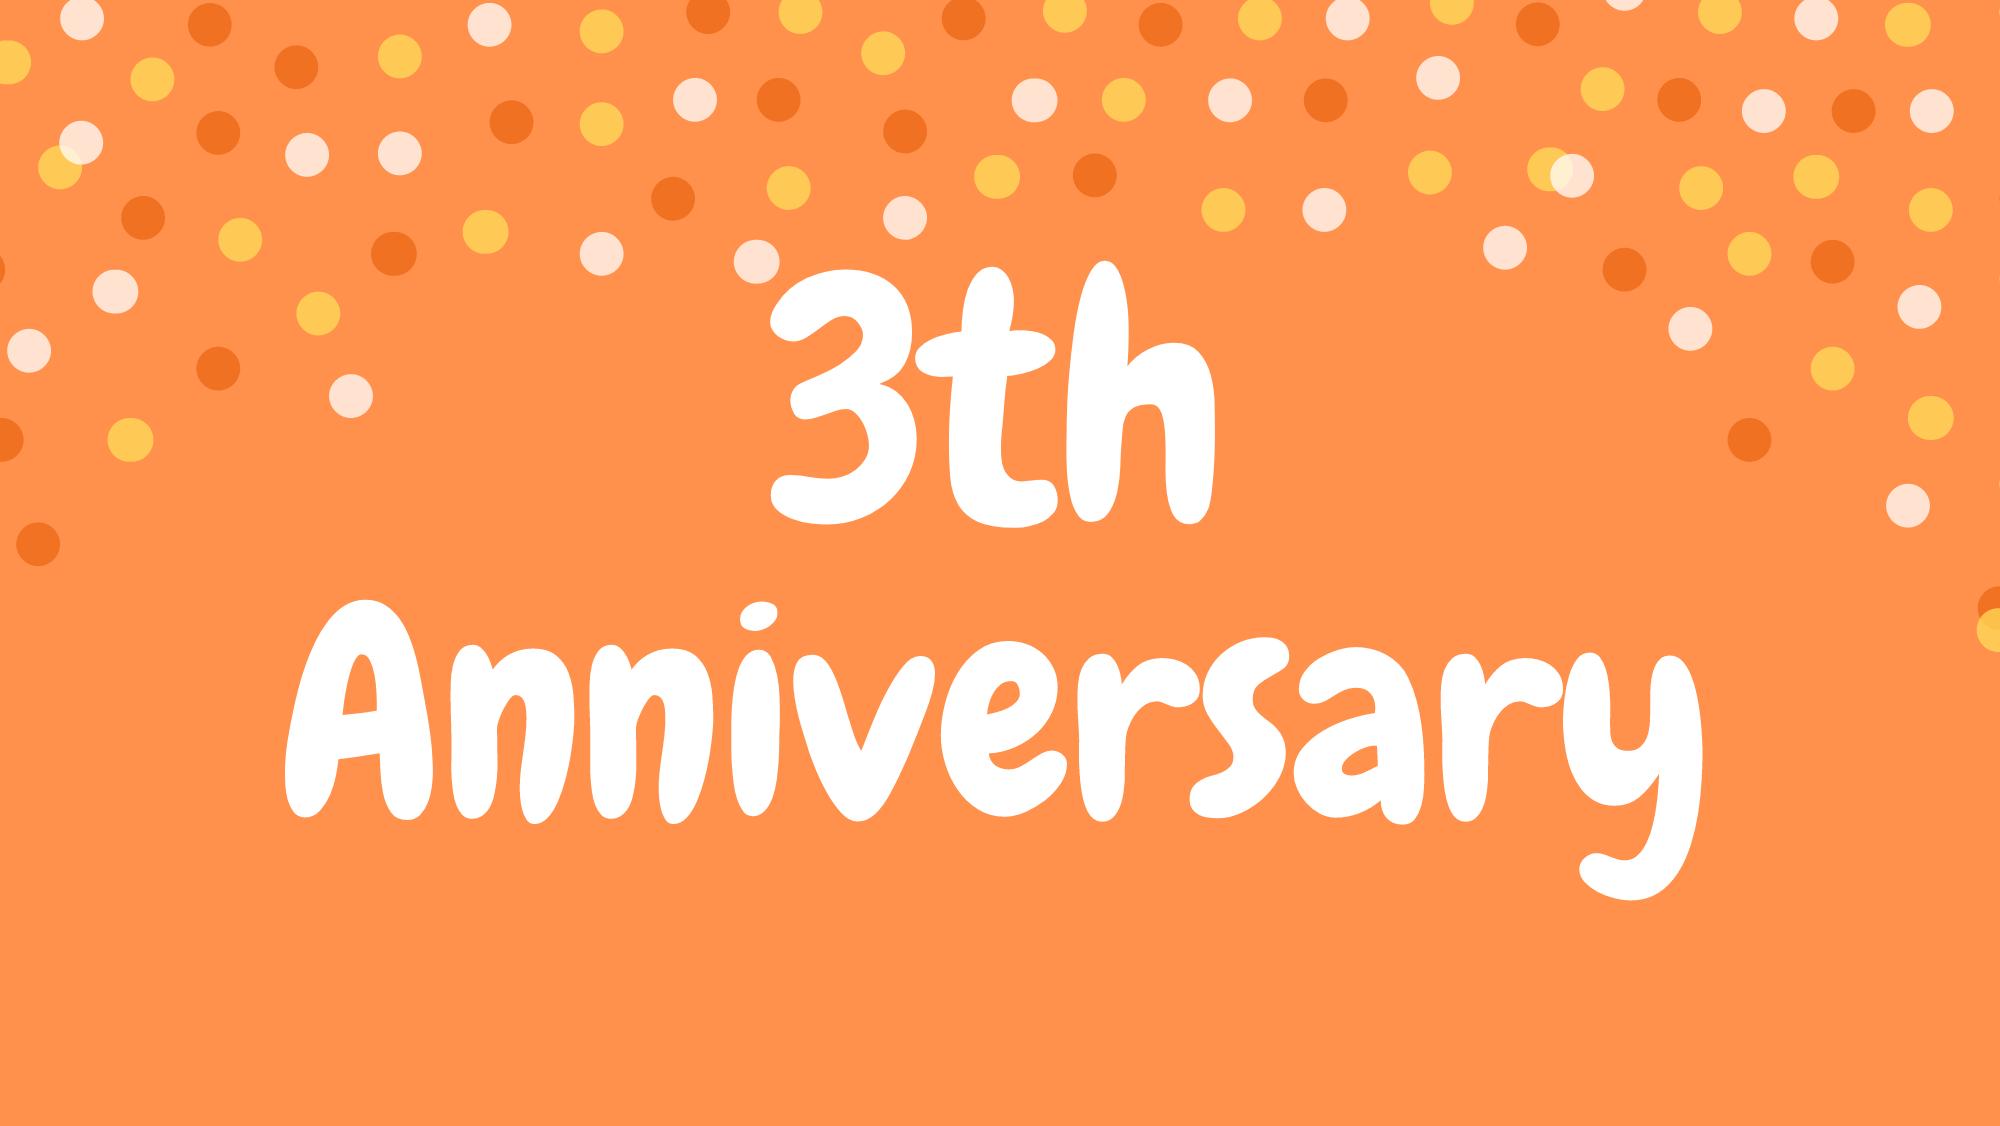 3th Anniversary